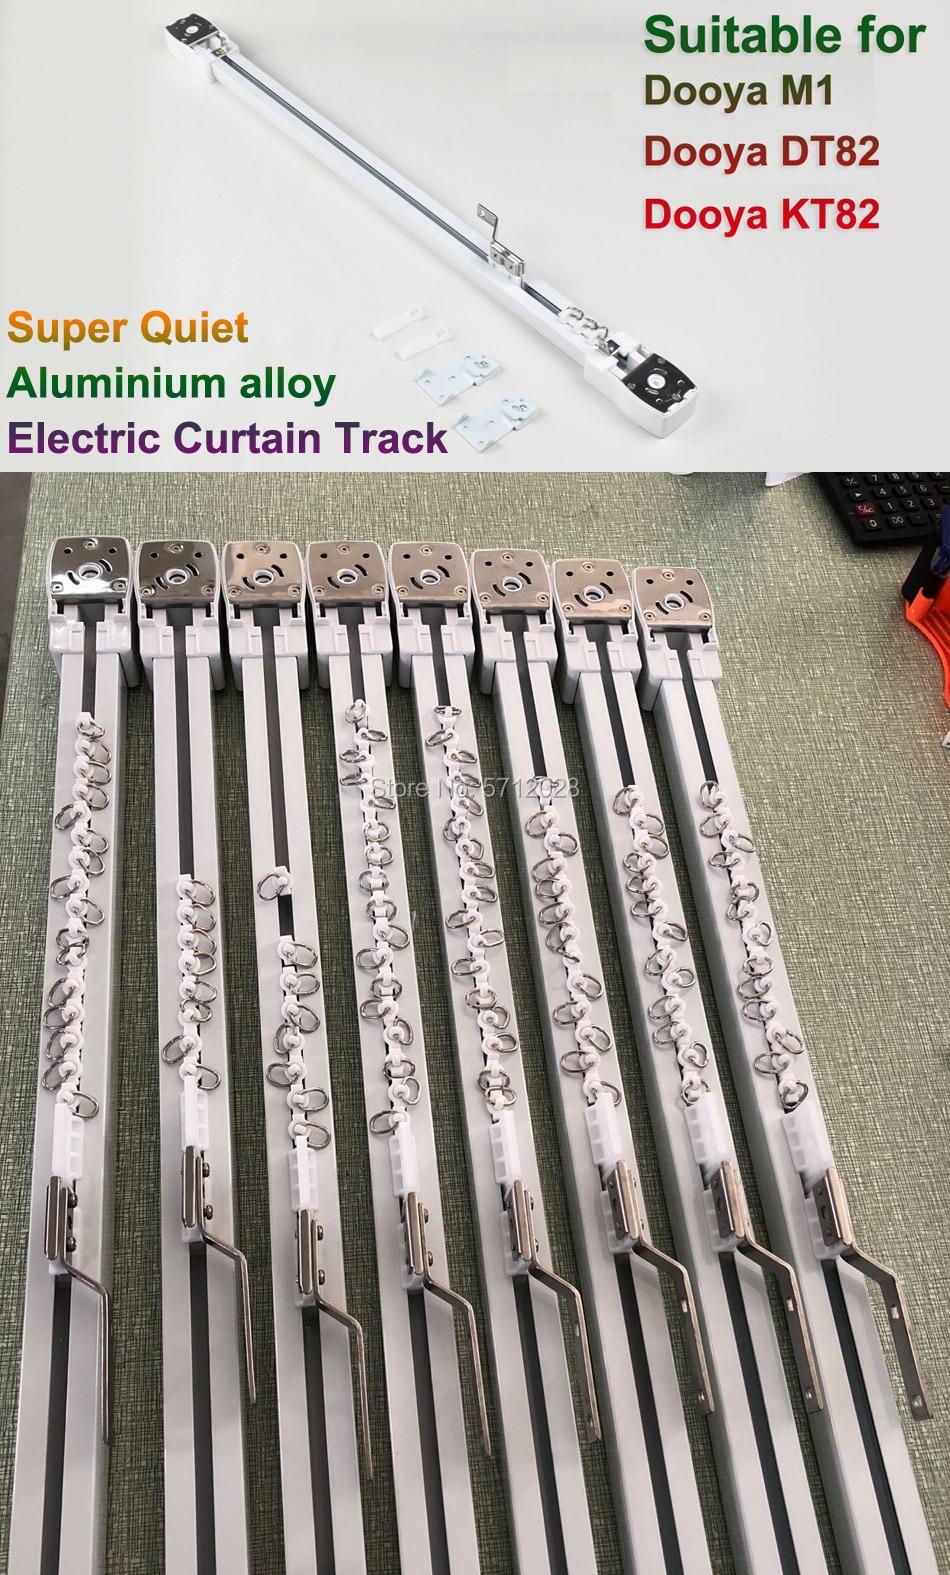 Pista de cortina eléctrica de aleación de aluminio súper silenciosa para Dooya motor M1/KT82TN/DT82 serie motor, sistema de riel de cortina para casa inteligente